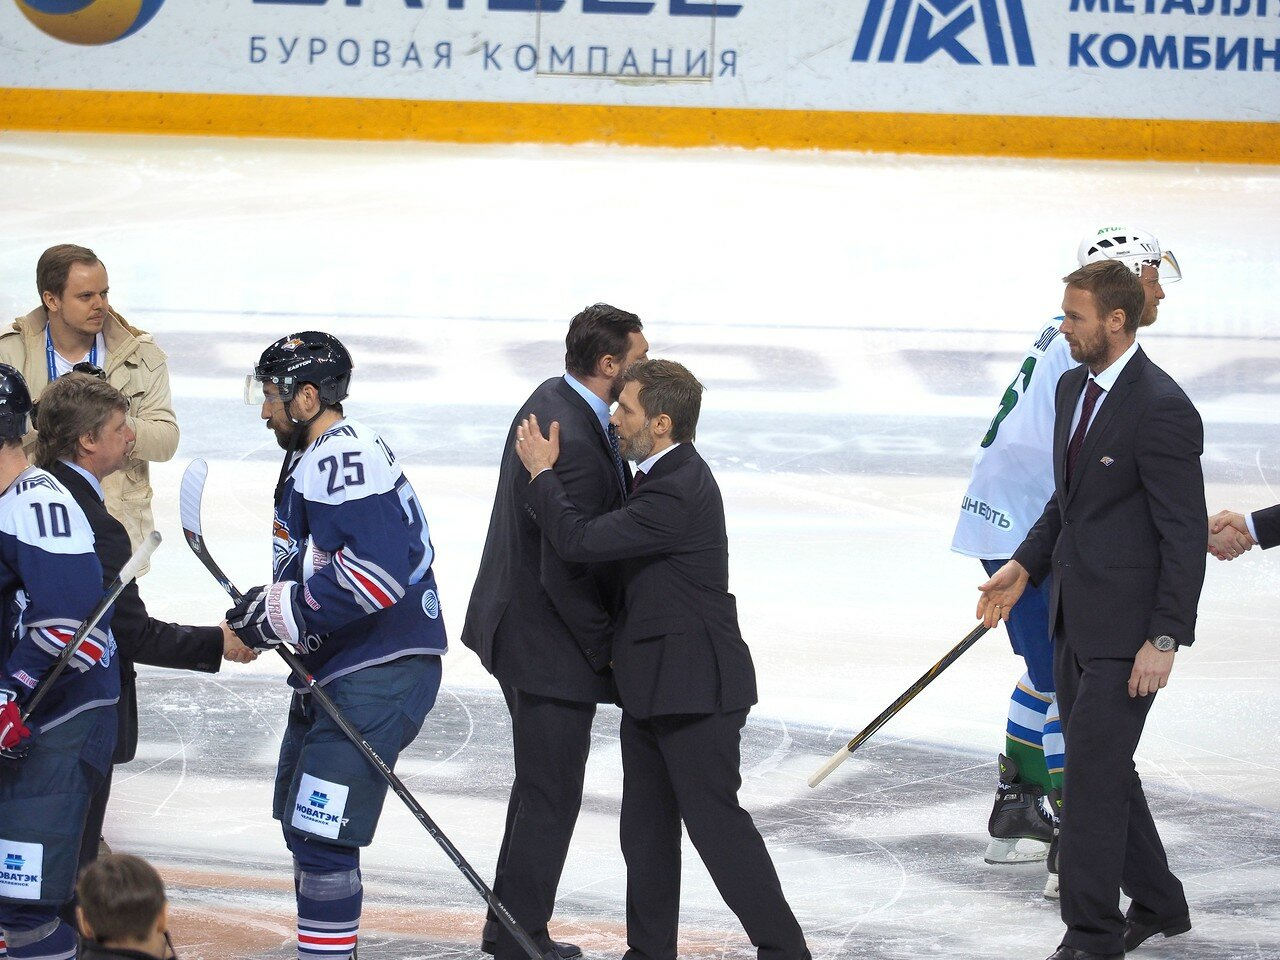 94Плей-офф 2016 Восток Финал Металлург - Салават Юлаев 31.03.2016